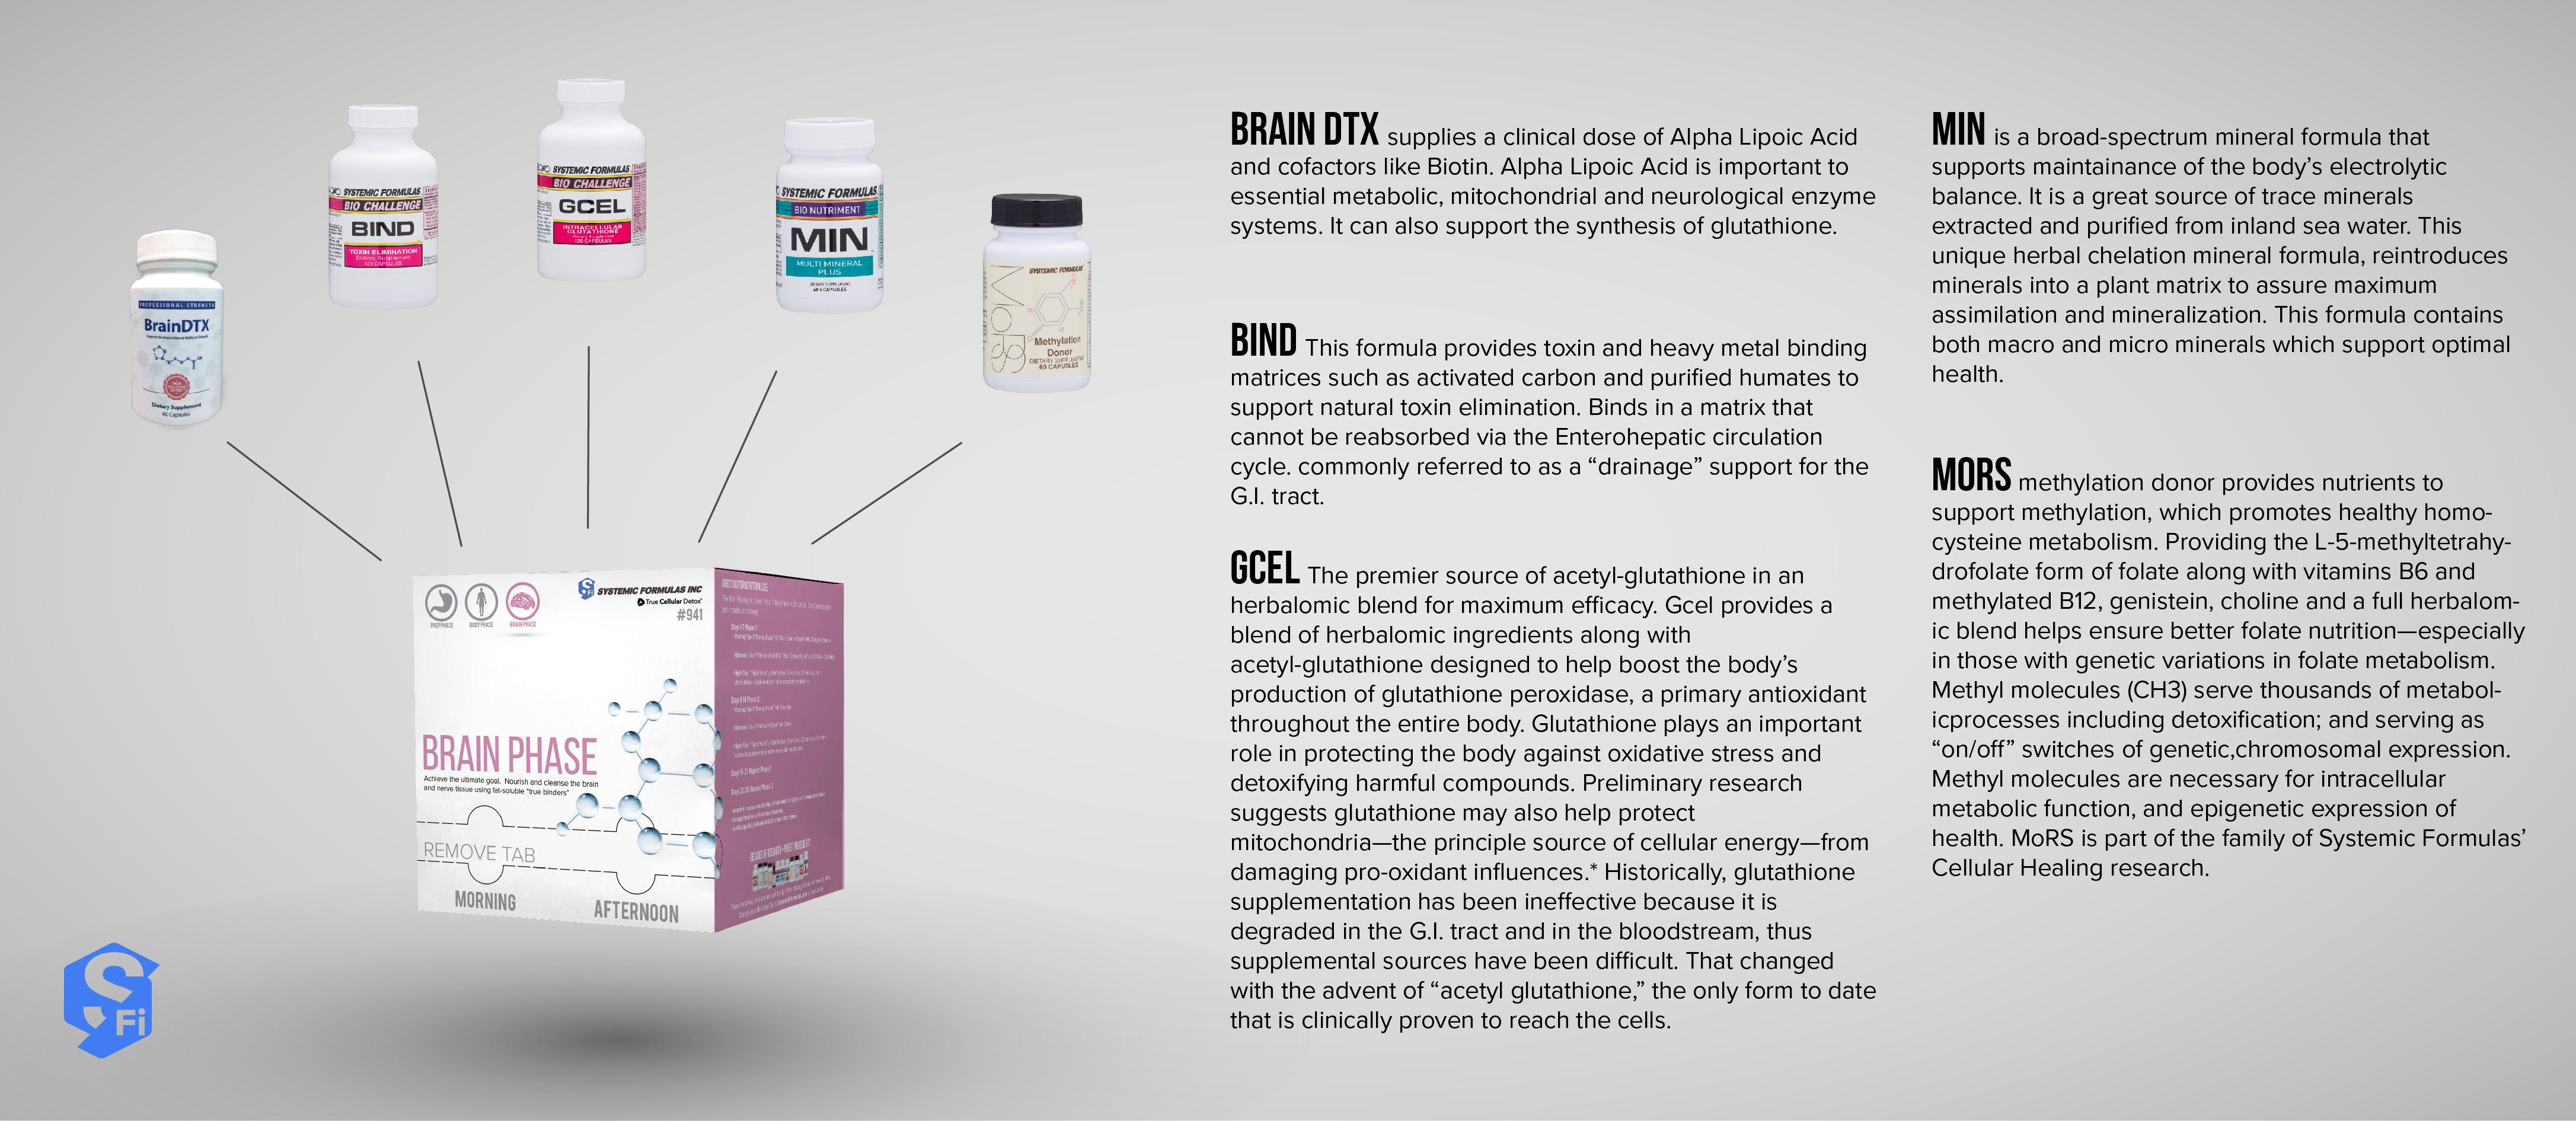 Brain Phase infographic